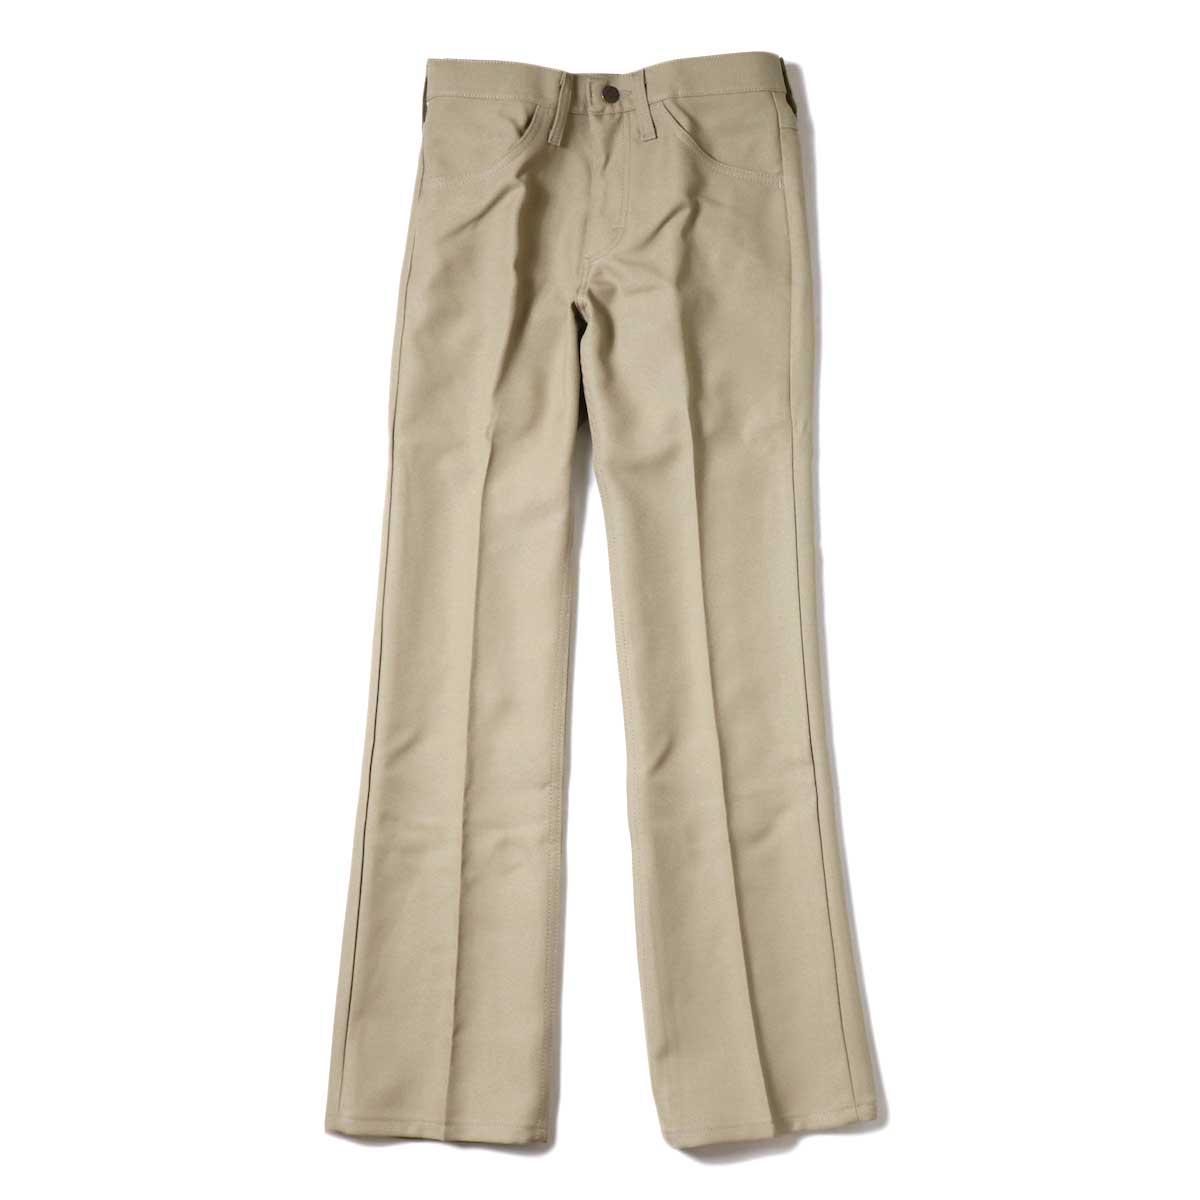 Wrangler / WRANCHER DRESS JEANS (Tan)